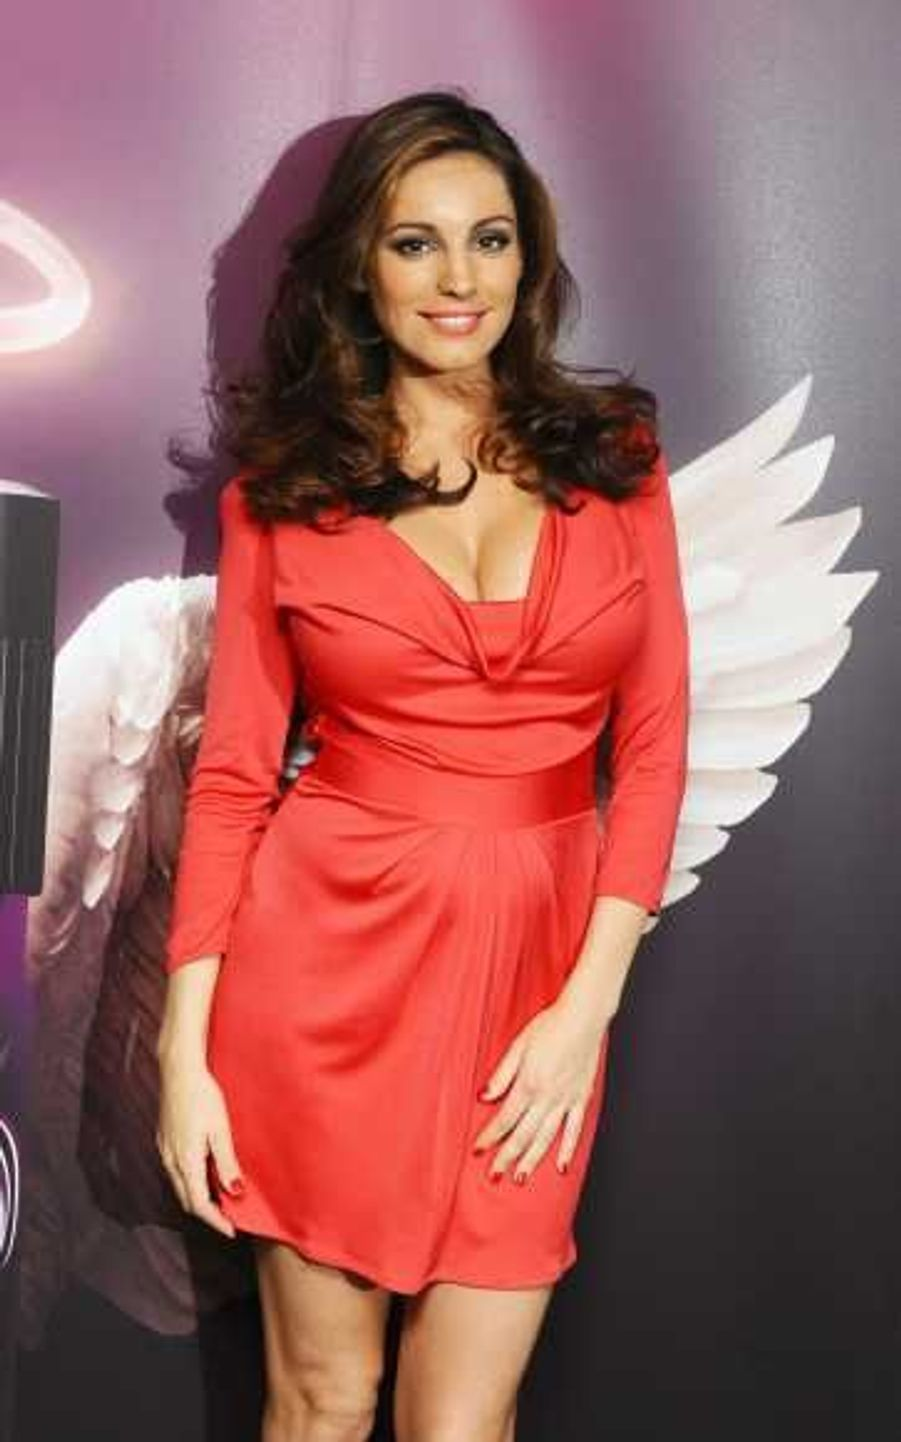 L'ange Kelly